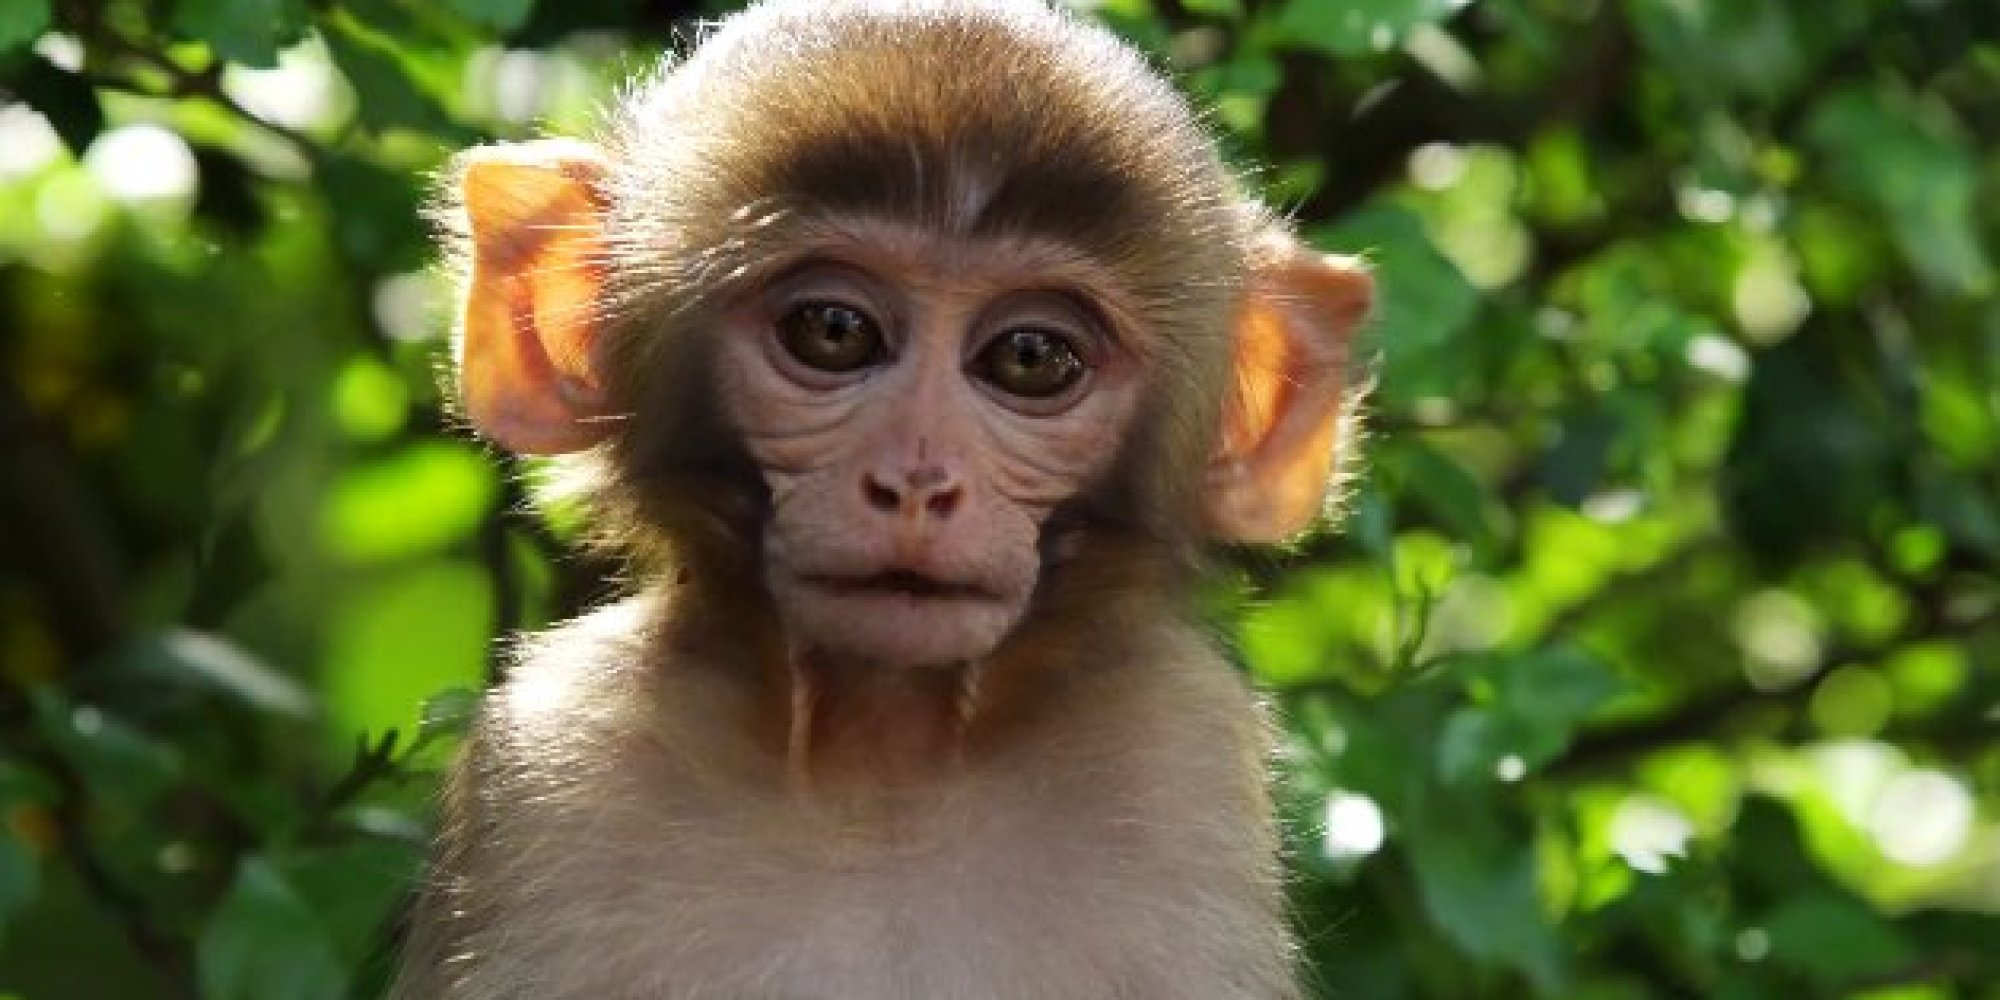 Monkeys: Pictures, Videos, Breaking News